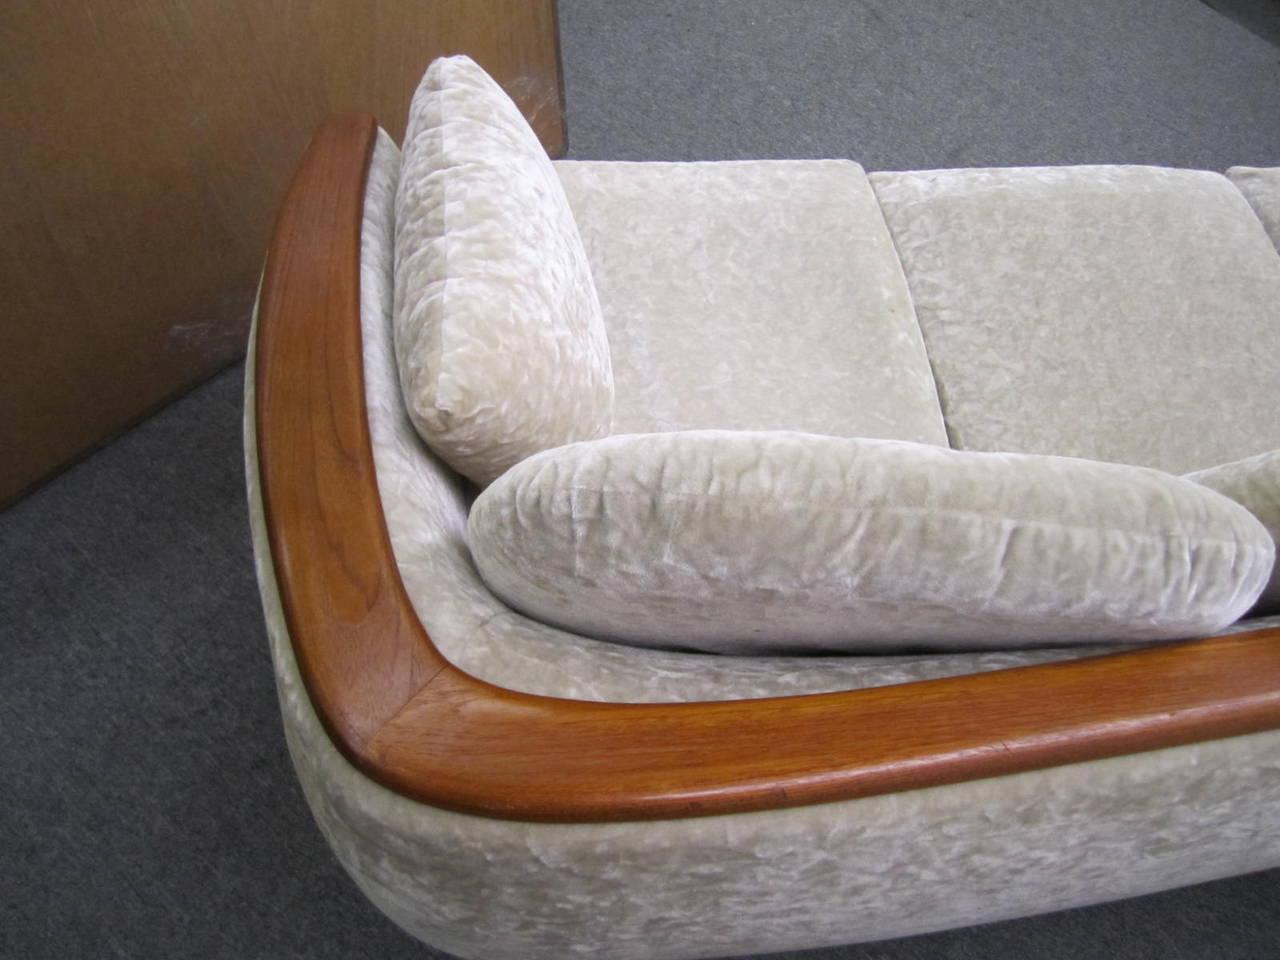 Upholstery Dazzling R. Huber Curved Back Teak Sofa, Mid-Century Danish Modern For Sale